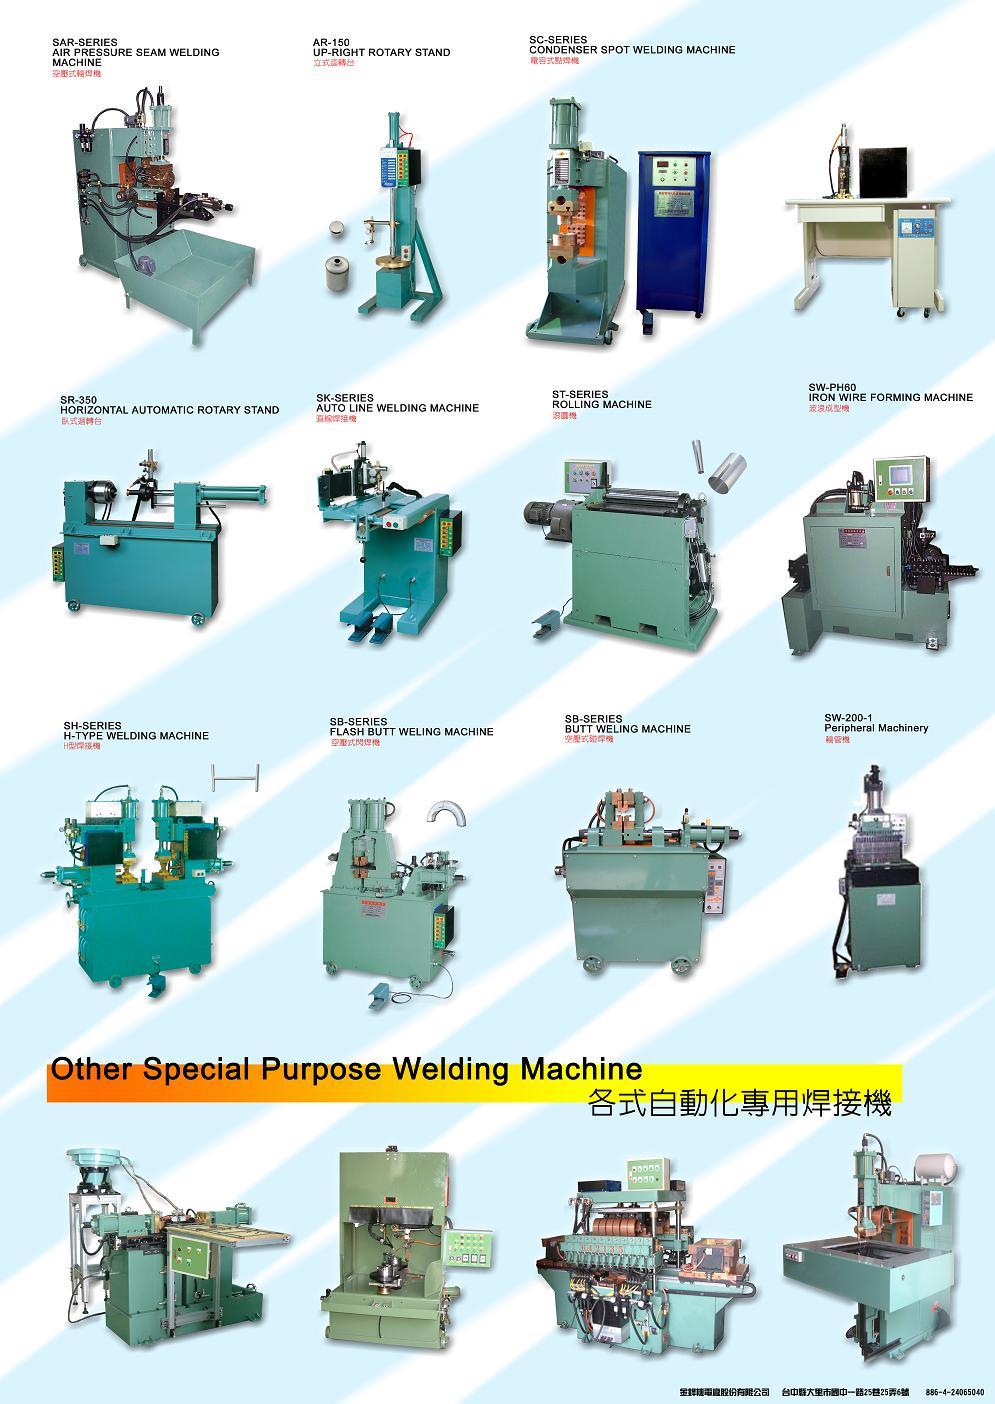 Welding Machine Manufacturer By Golden Spot Industry Inc Taiwan Diagram